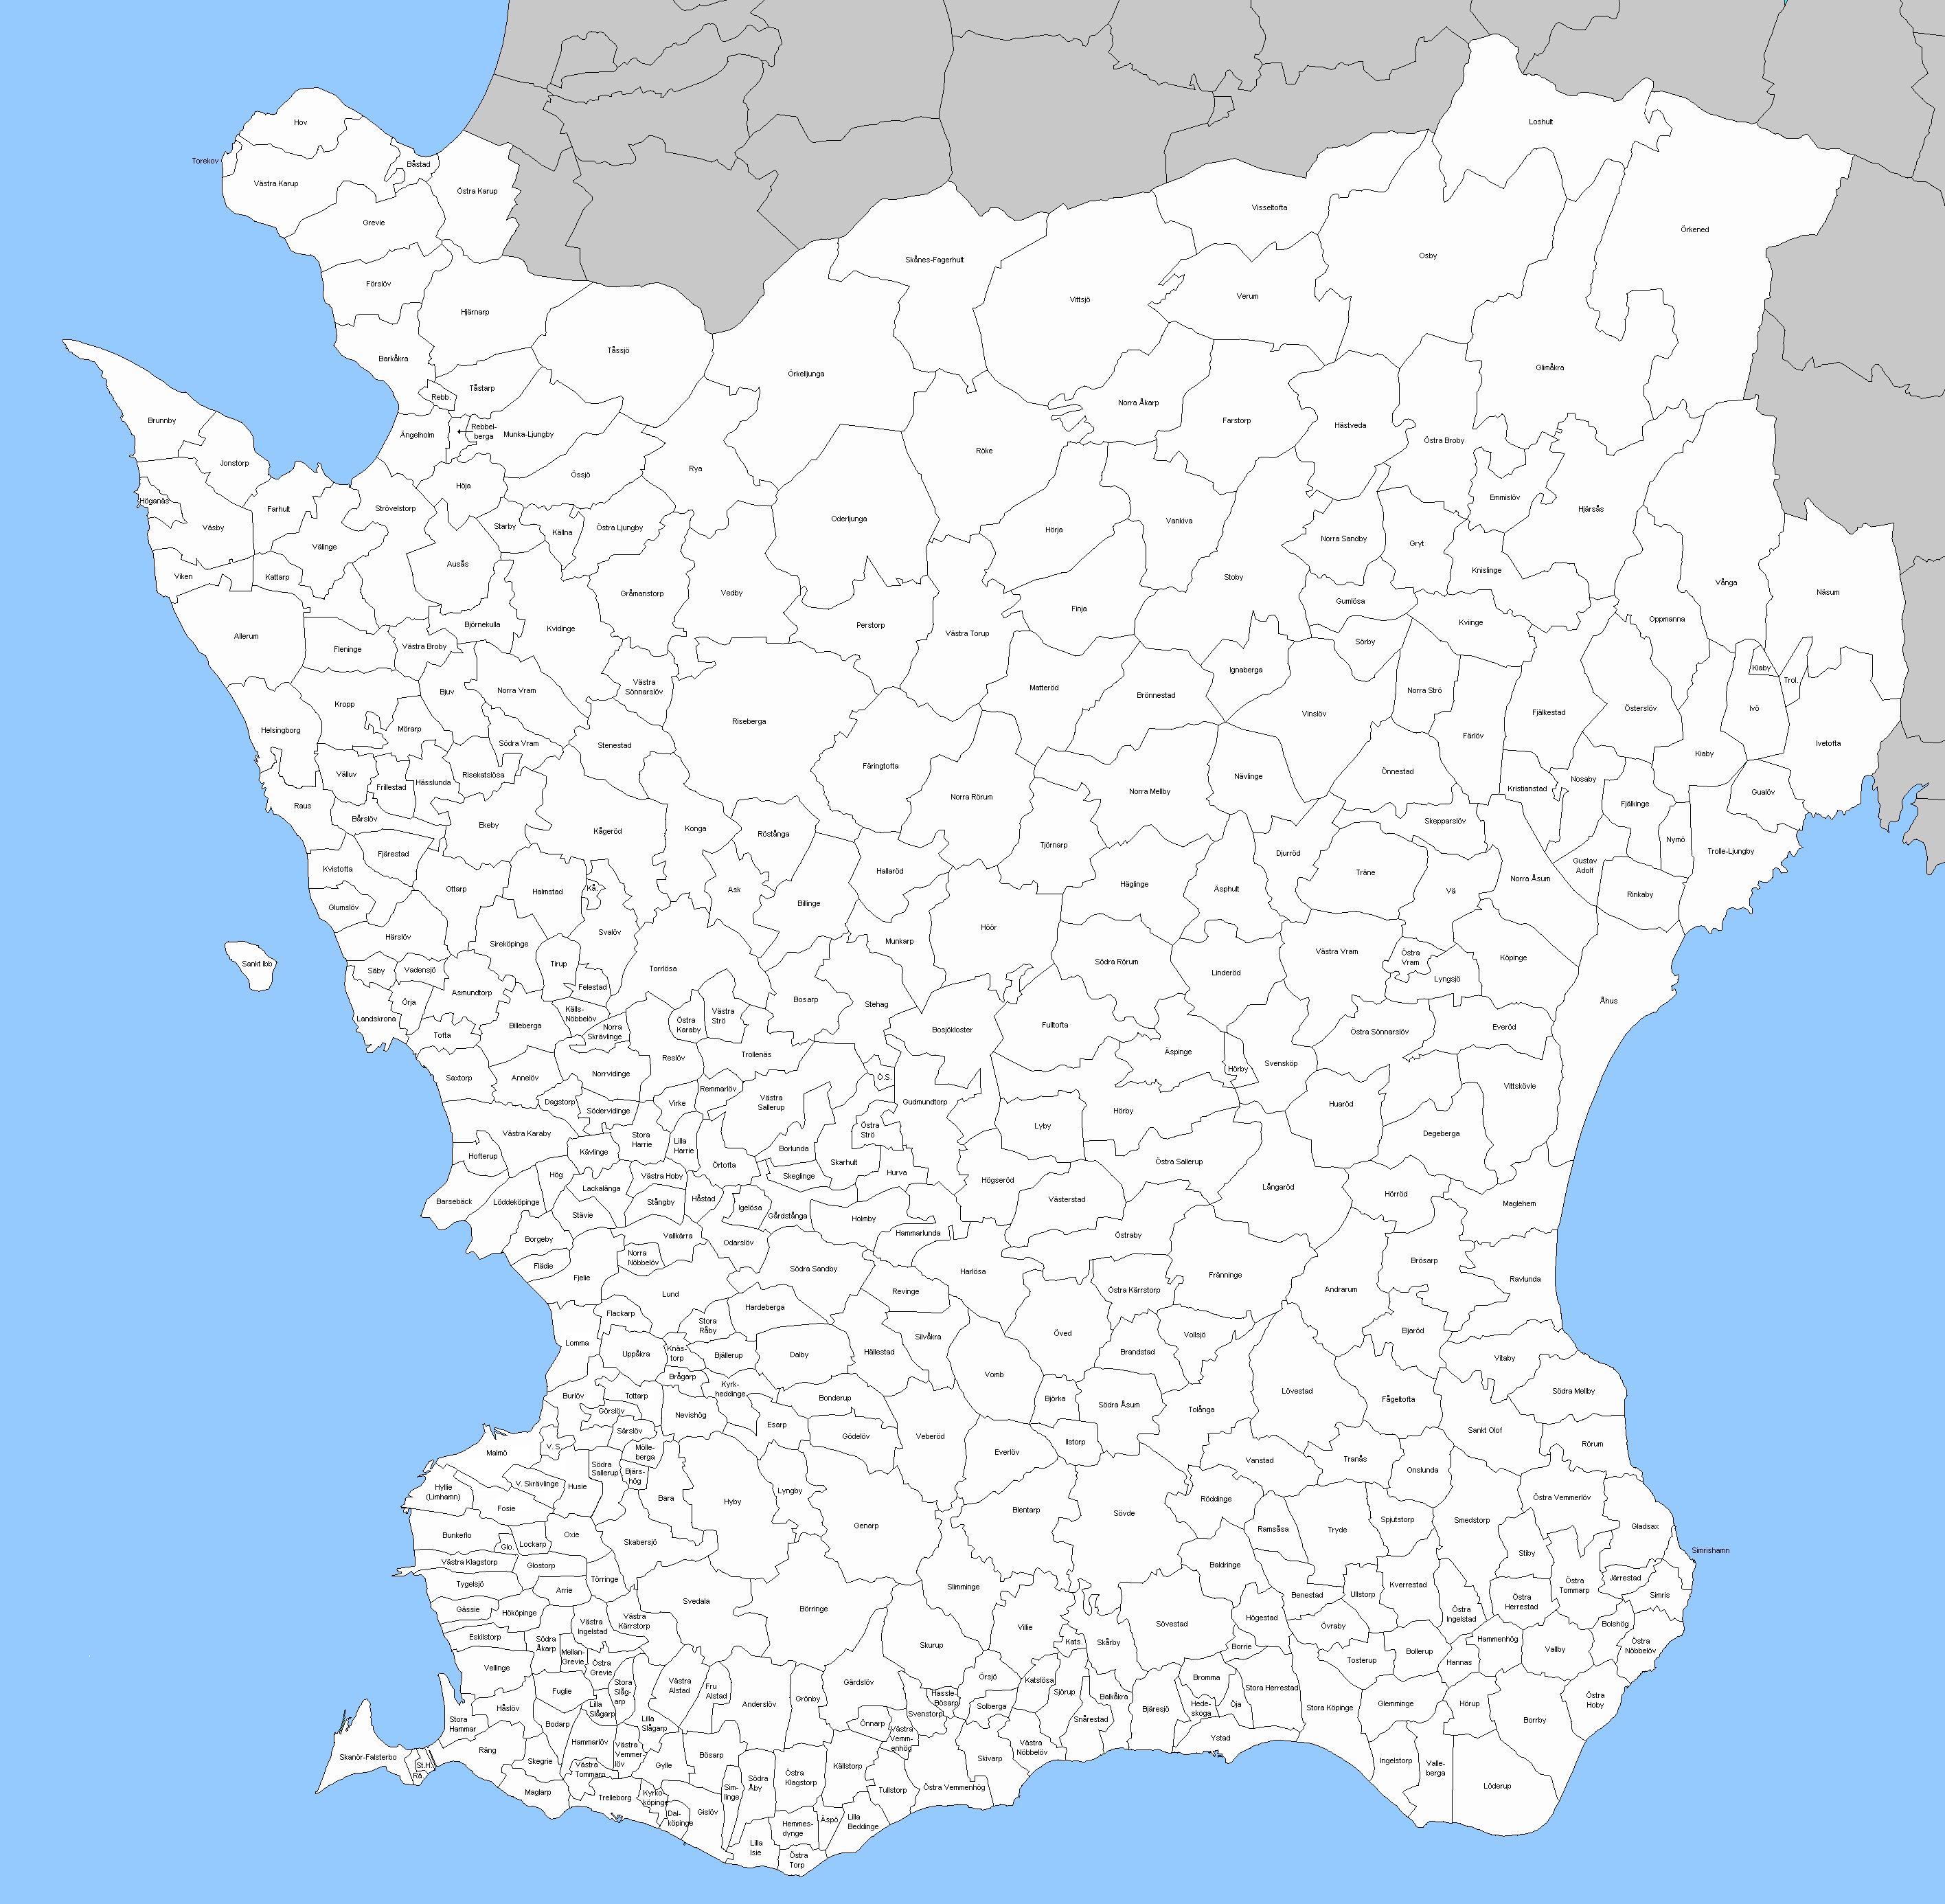 östra karup karta File:Sockenkarta Skåne.png   Wikimedia Commons östra karup karta